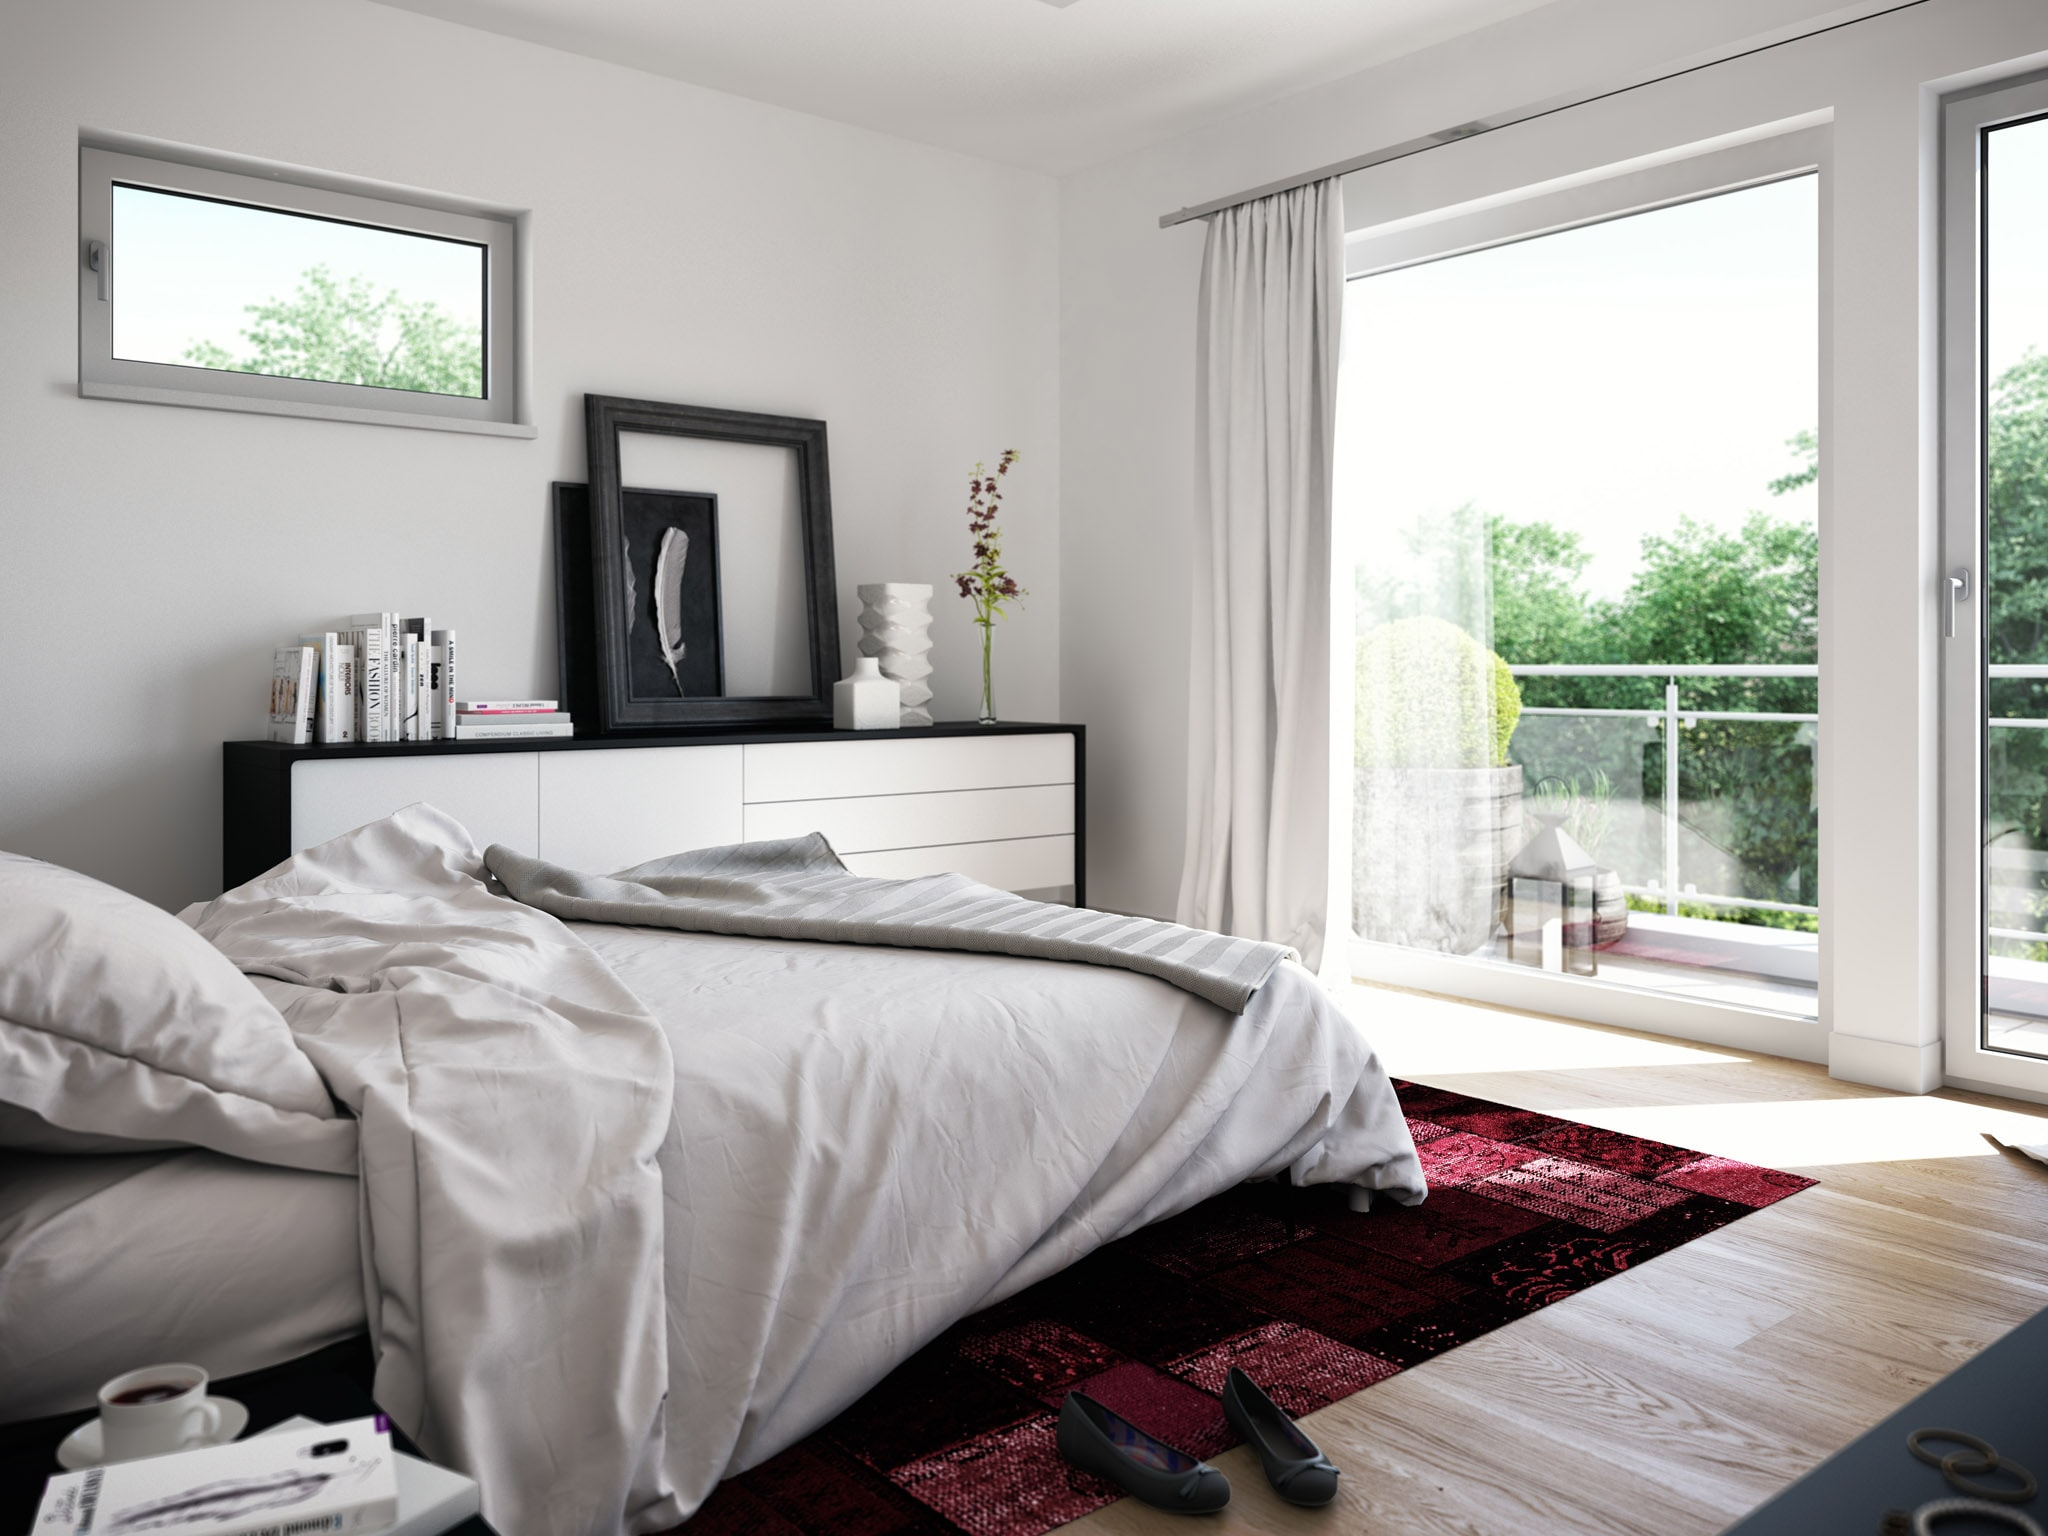 Modernes Schlafzimmer - Interior Design Fertighaus Living Haus SUNSHINE 136 V5 - HausbauDirekt.de